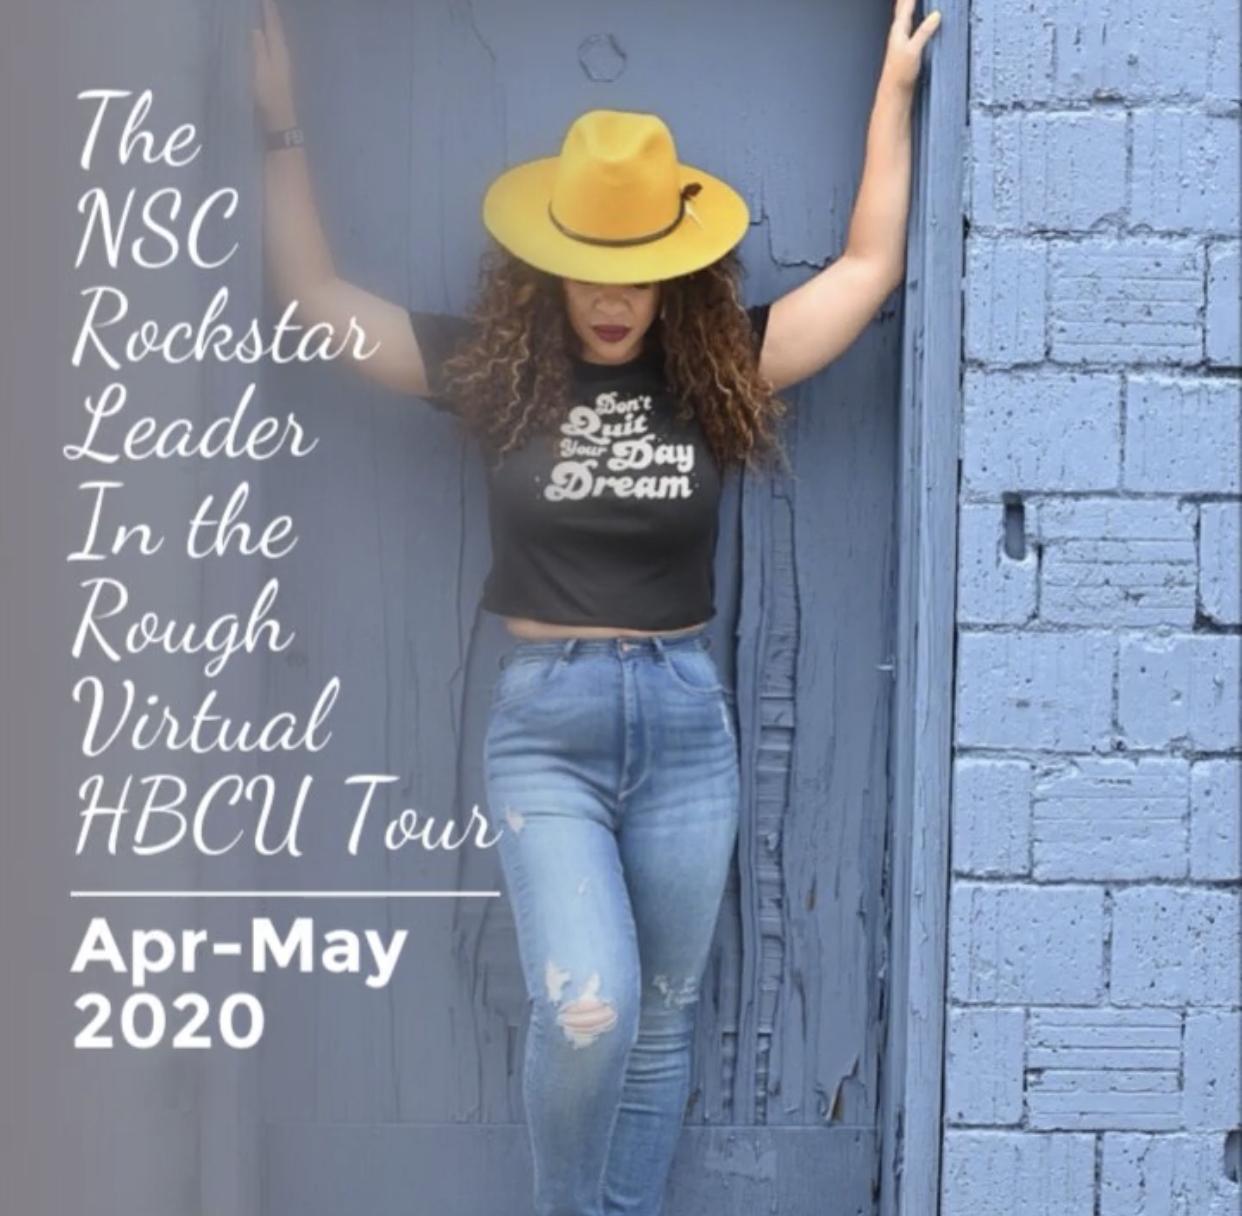 The NSC Rockstar Leader In the Rough Virtual HBCU Tour